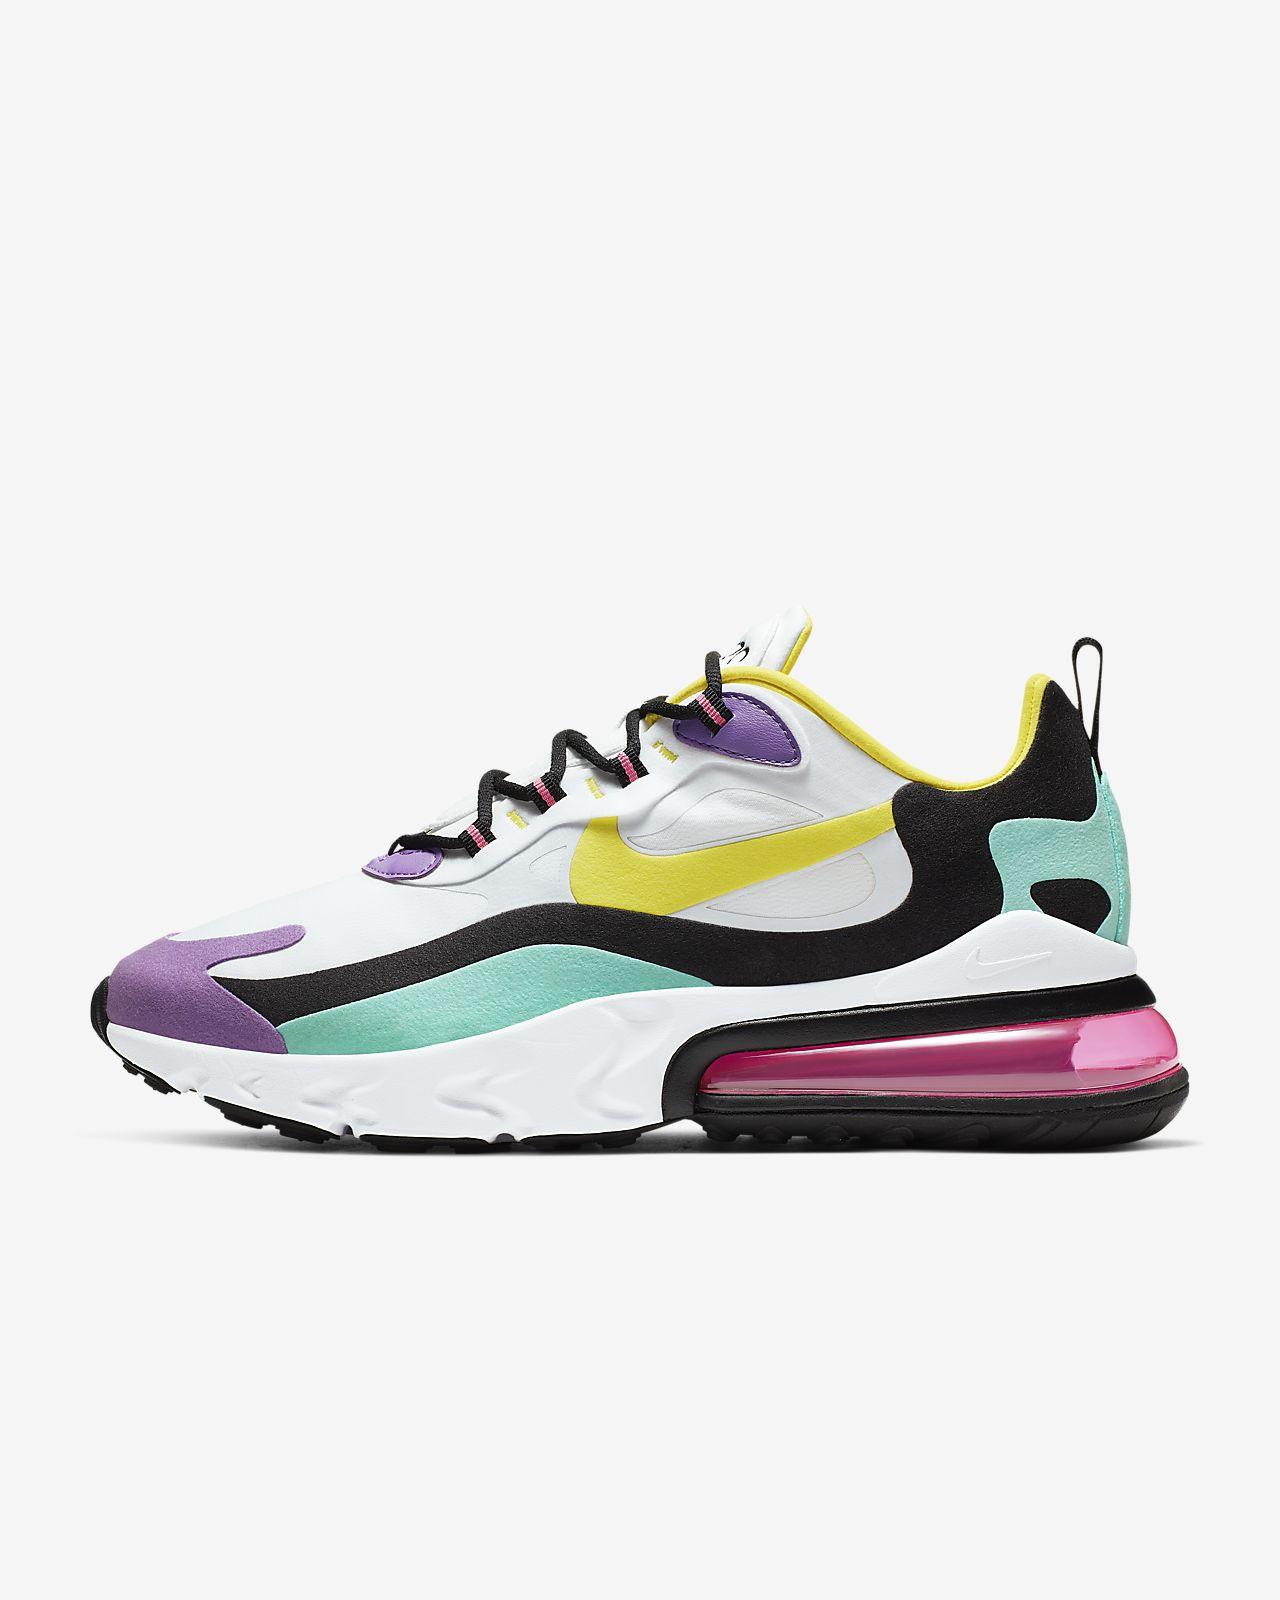 Nike Air Max 270 React (Geometric Abstract) Men's Shoe